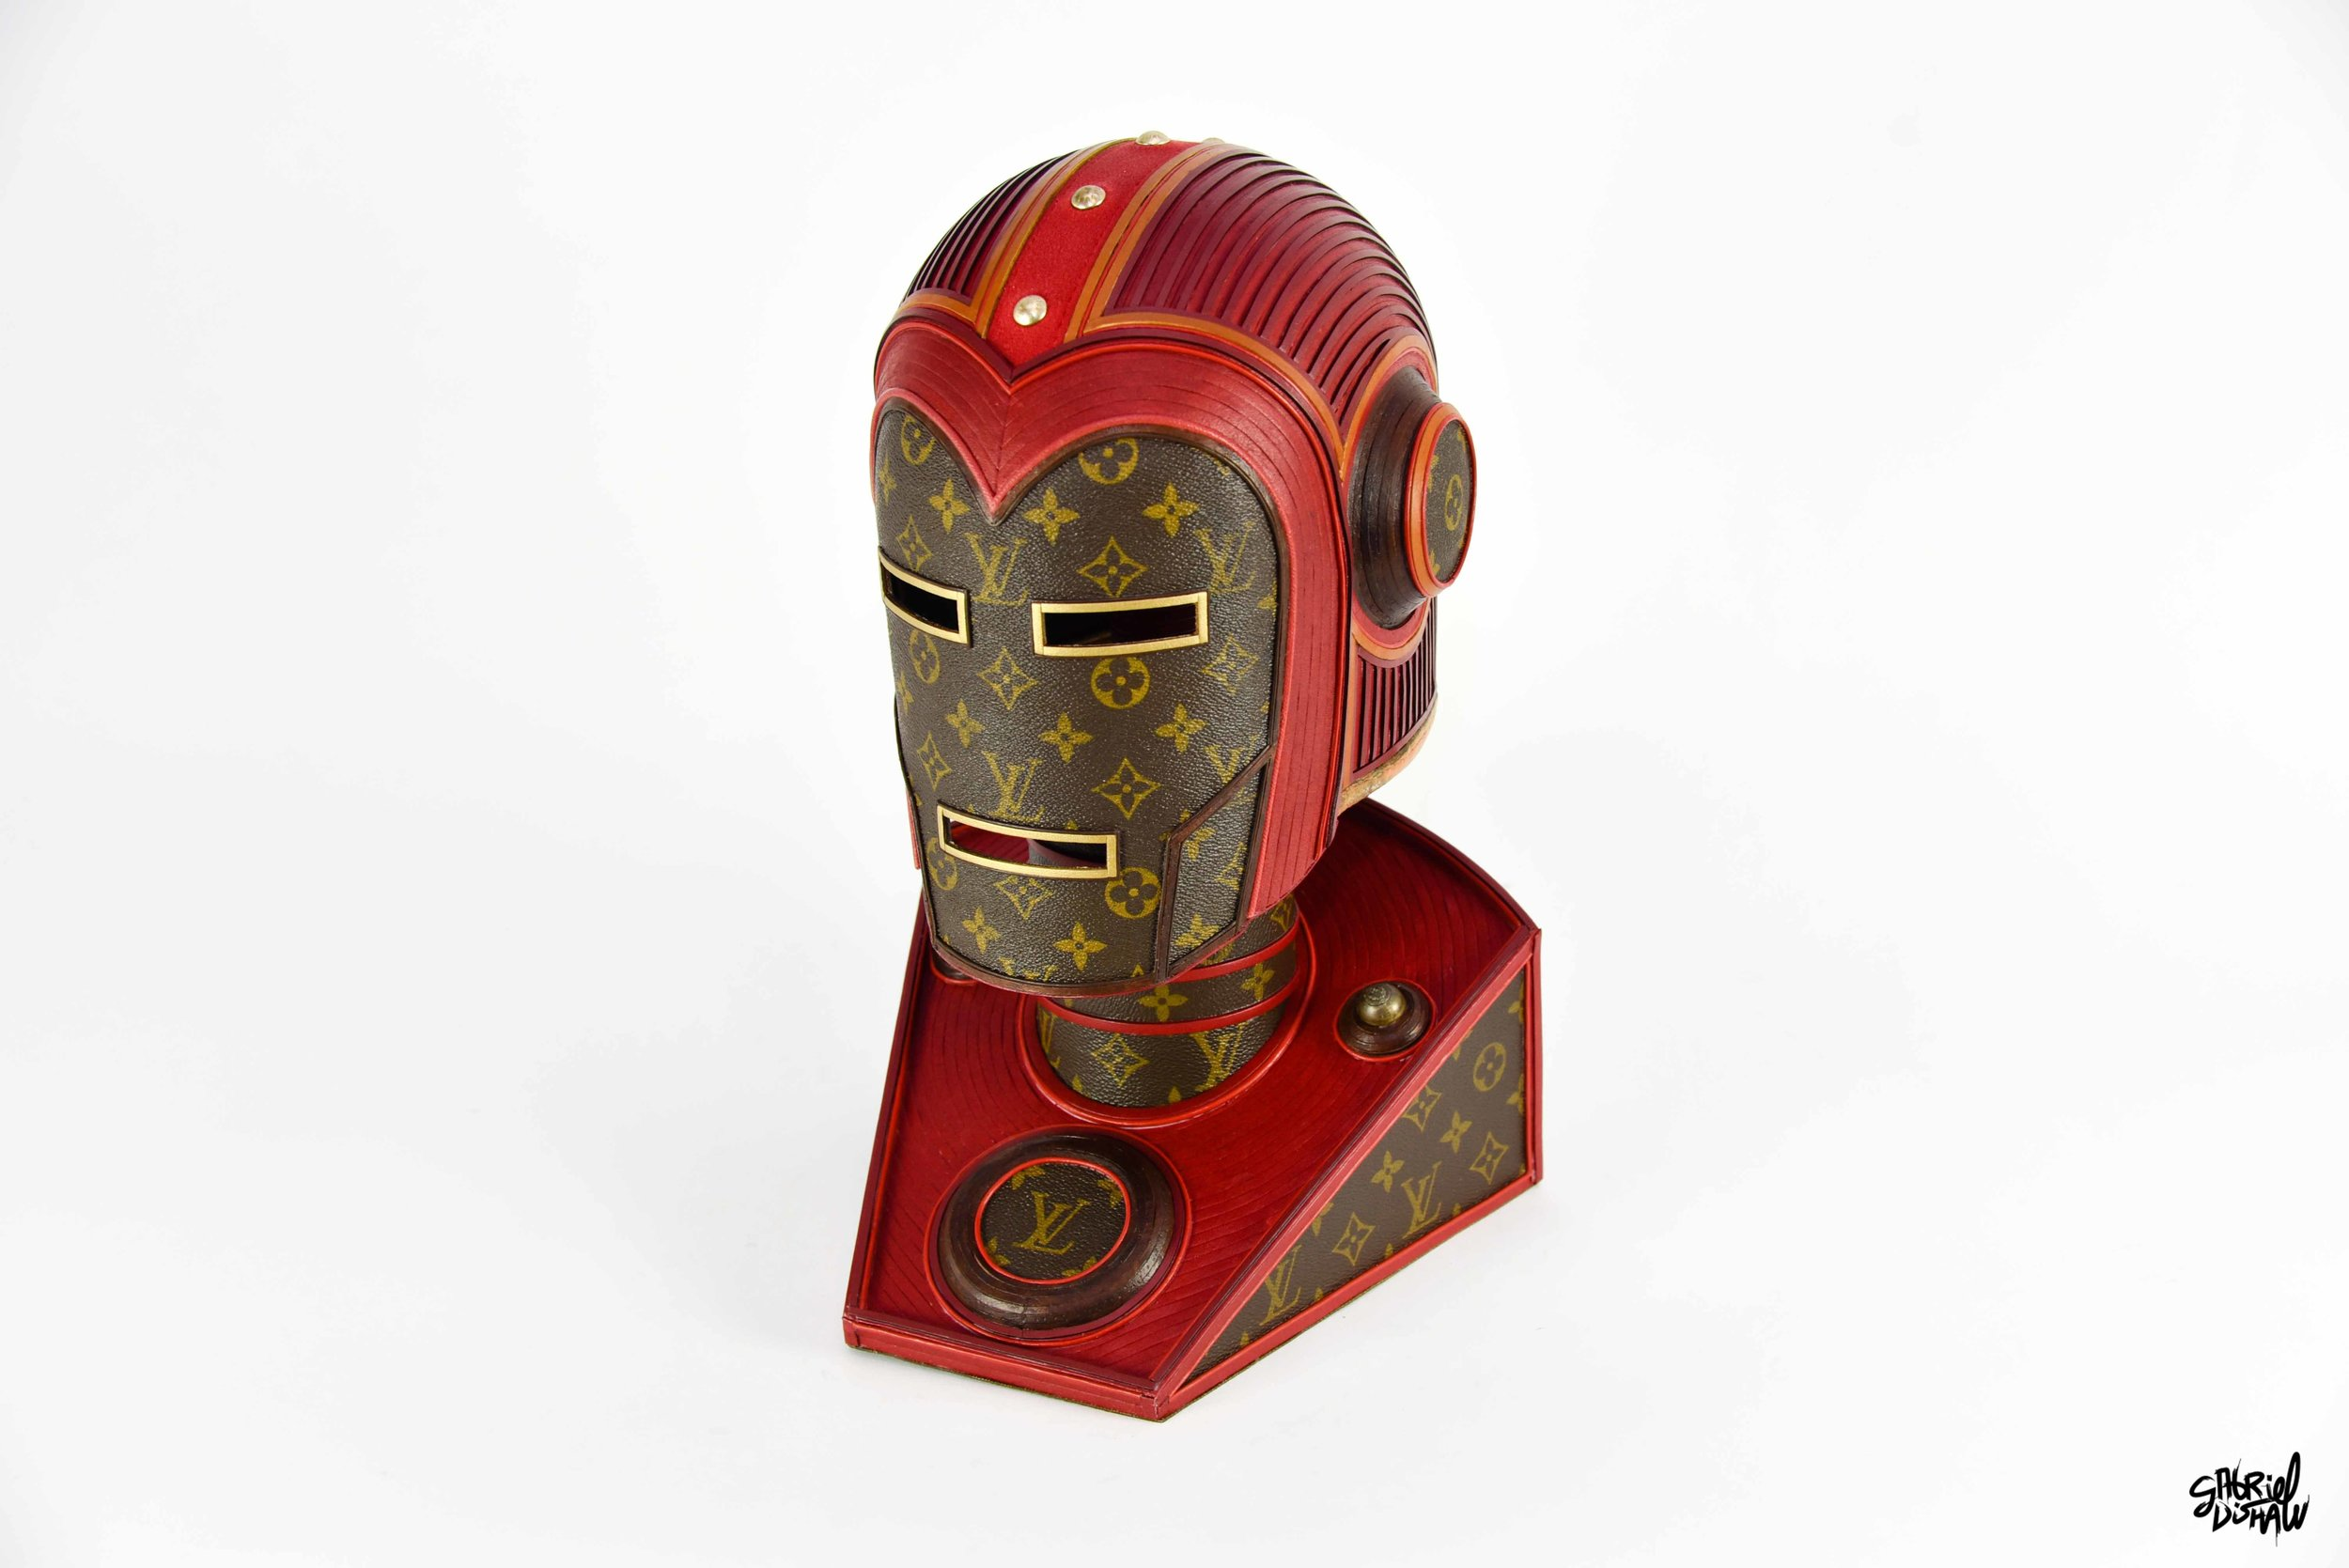 Gabriel Dishaw Vintage Iron Man LV-0216.jpg